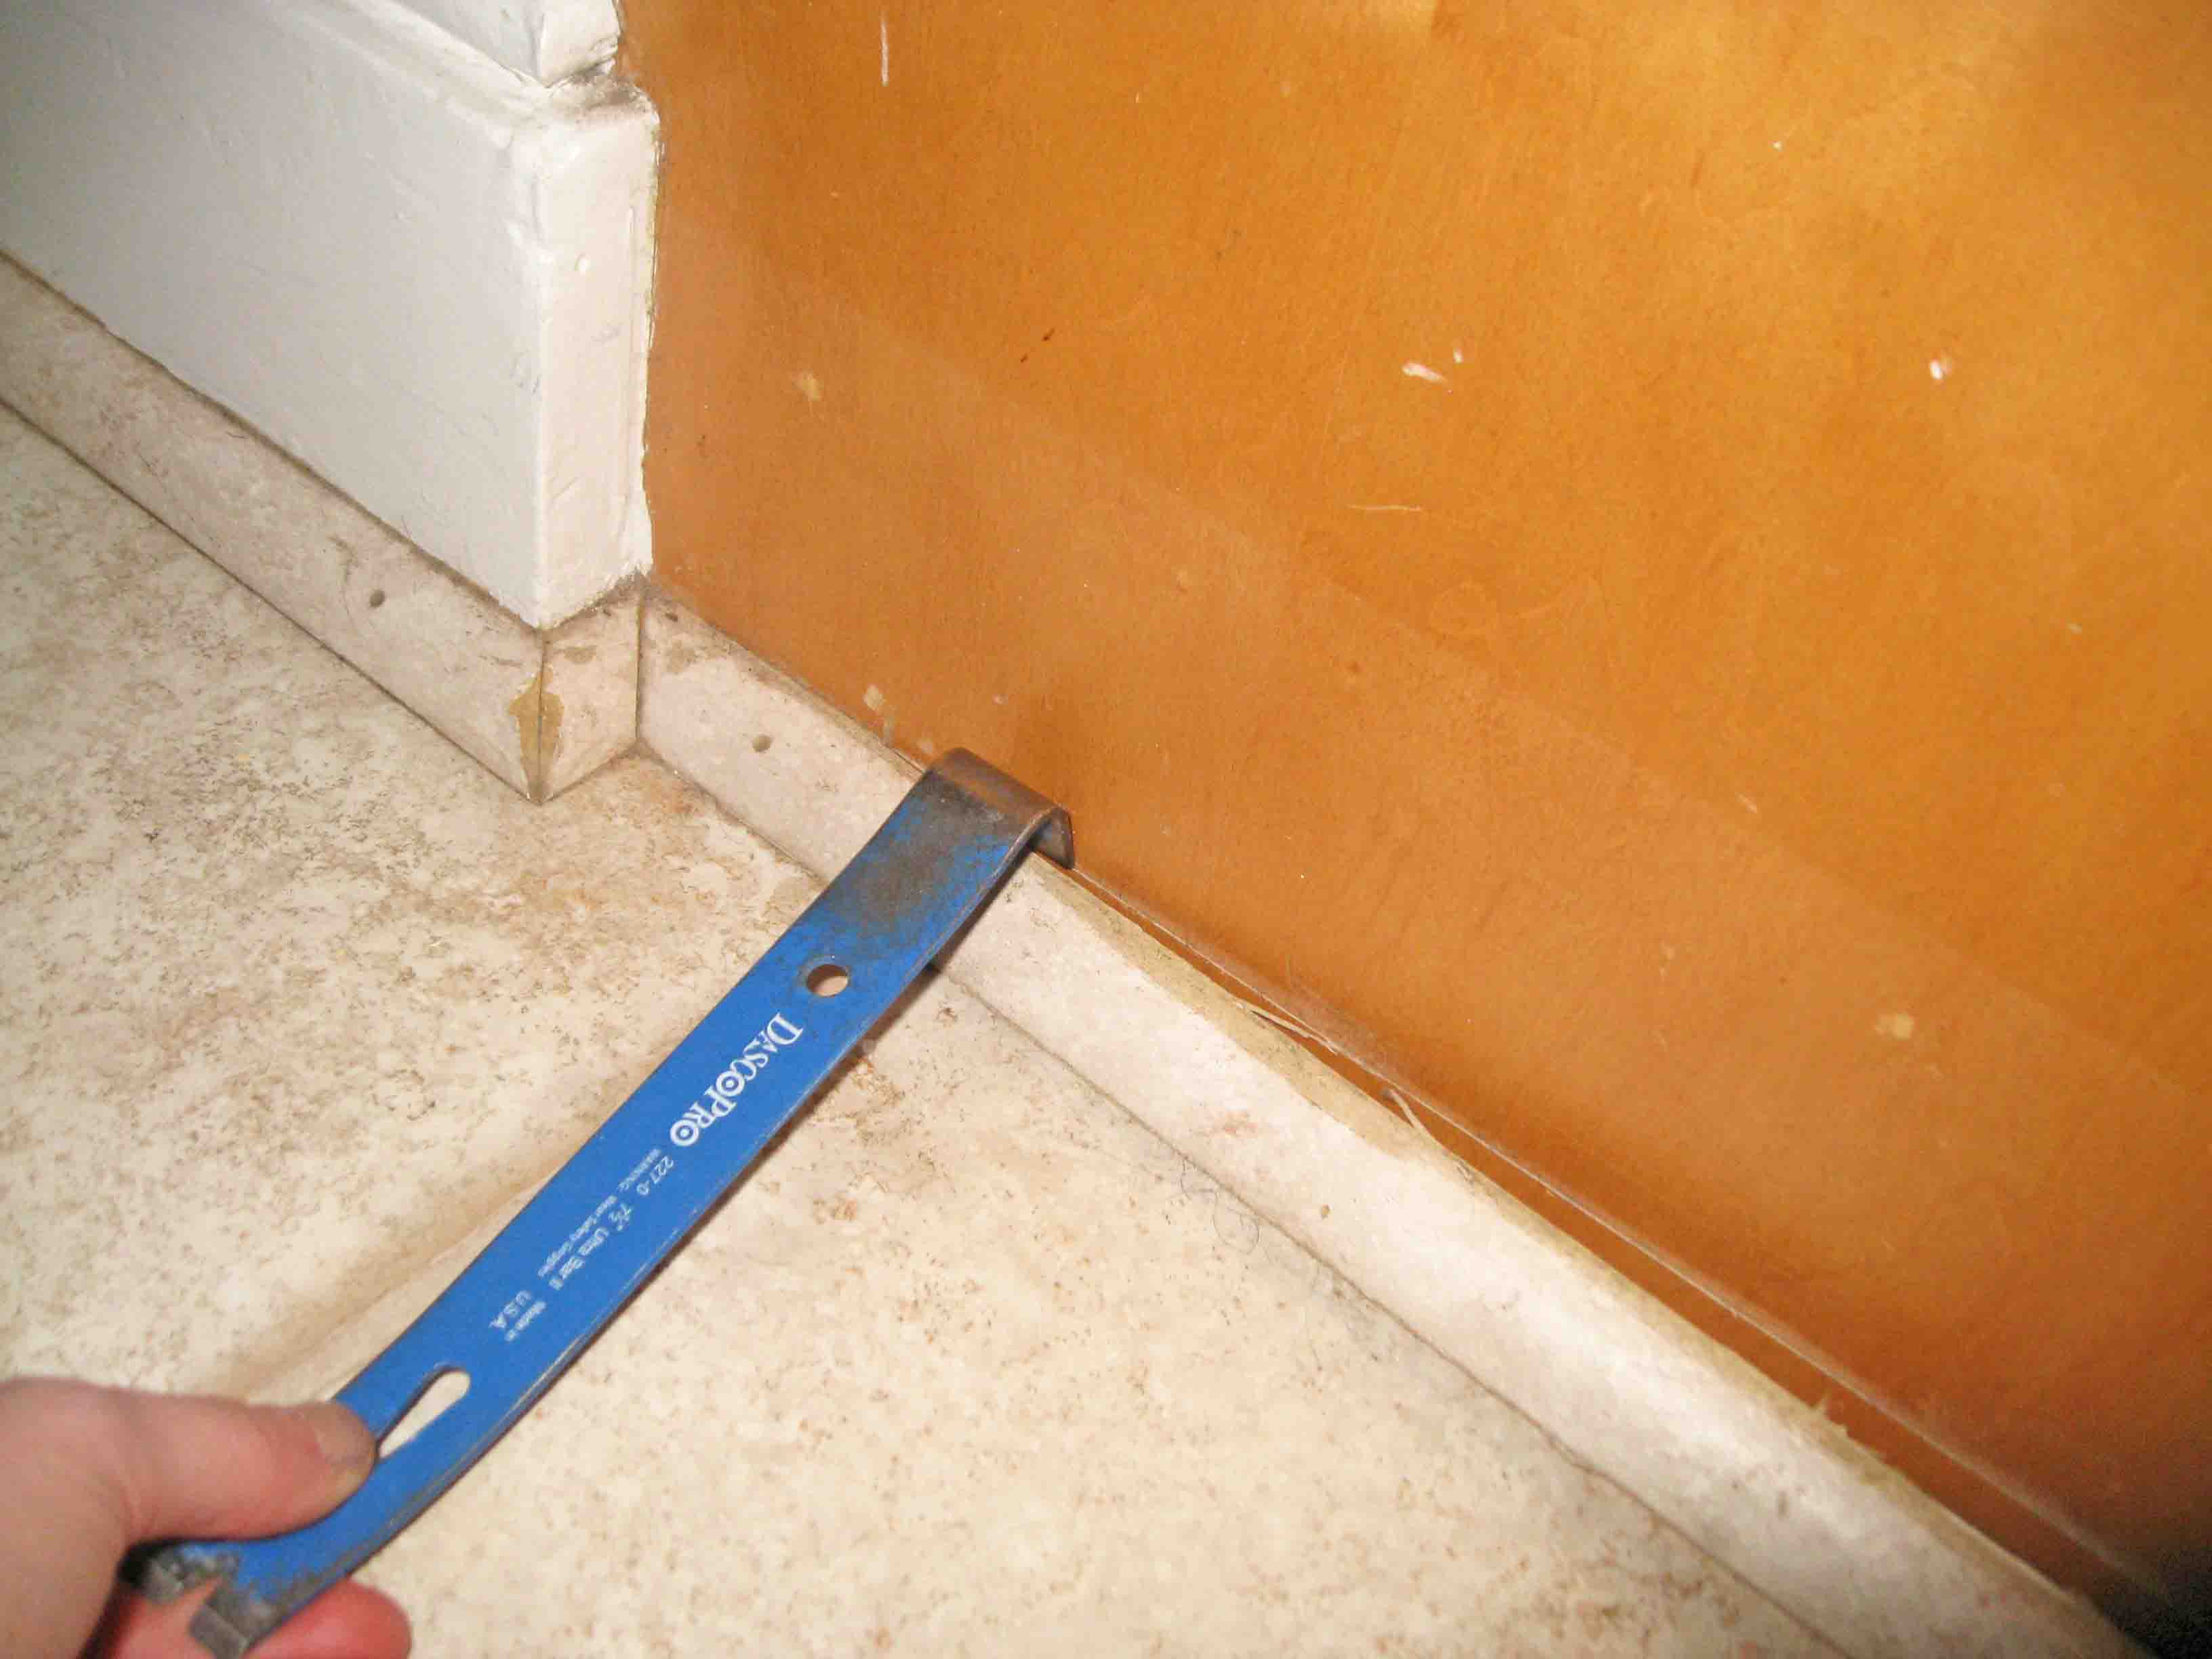 Layers of linoleum sunshineandsawdust removing linoleum flooring dailygadgetfo Choice Image